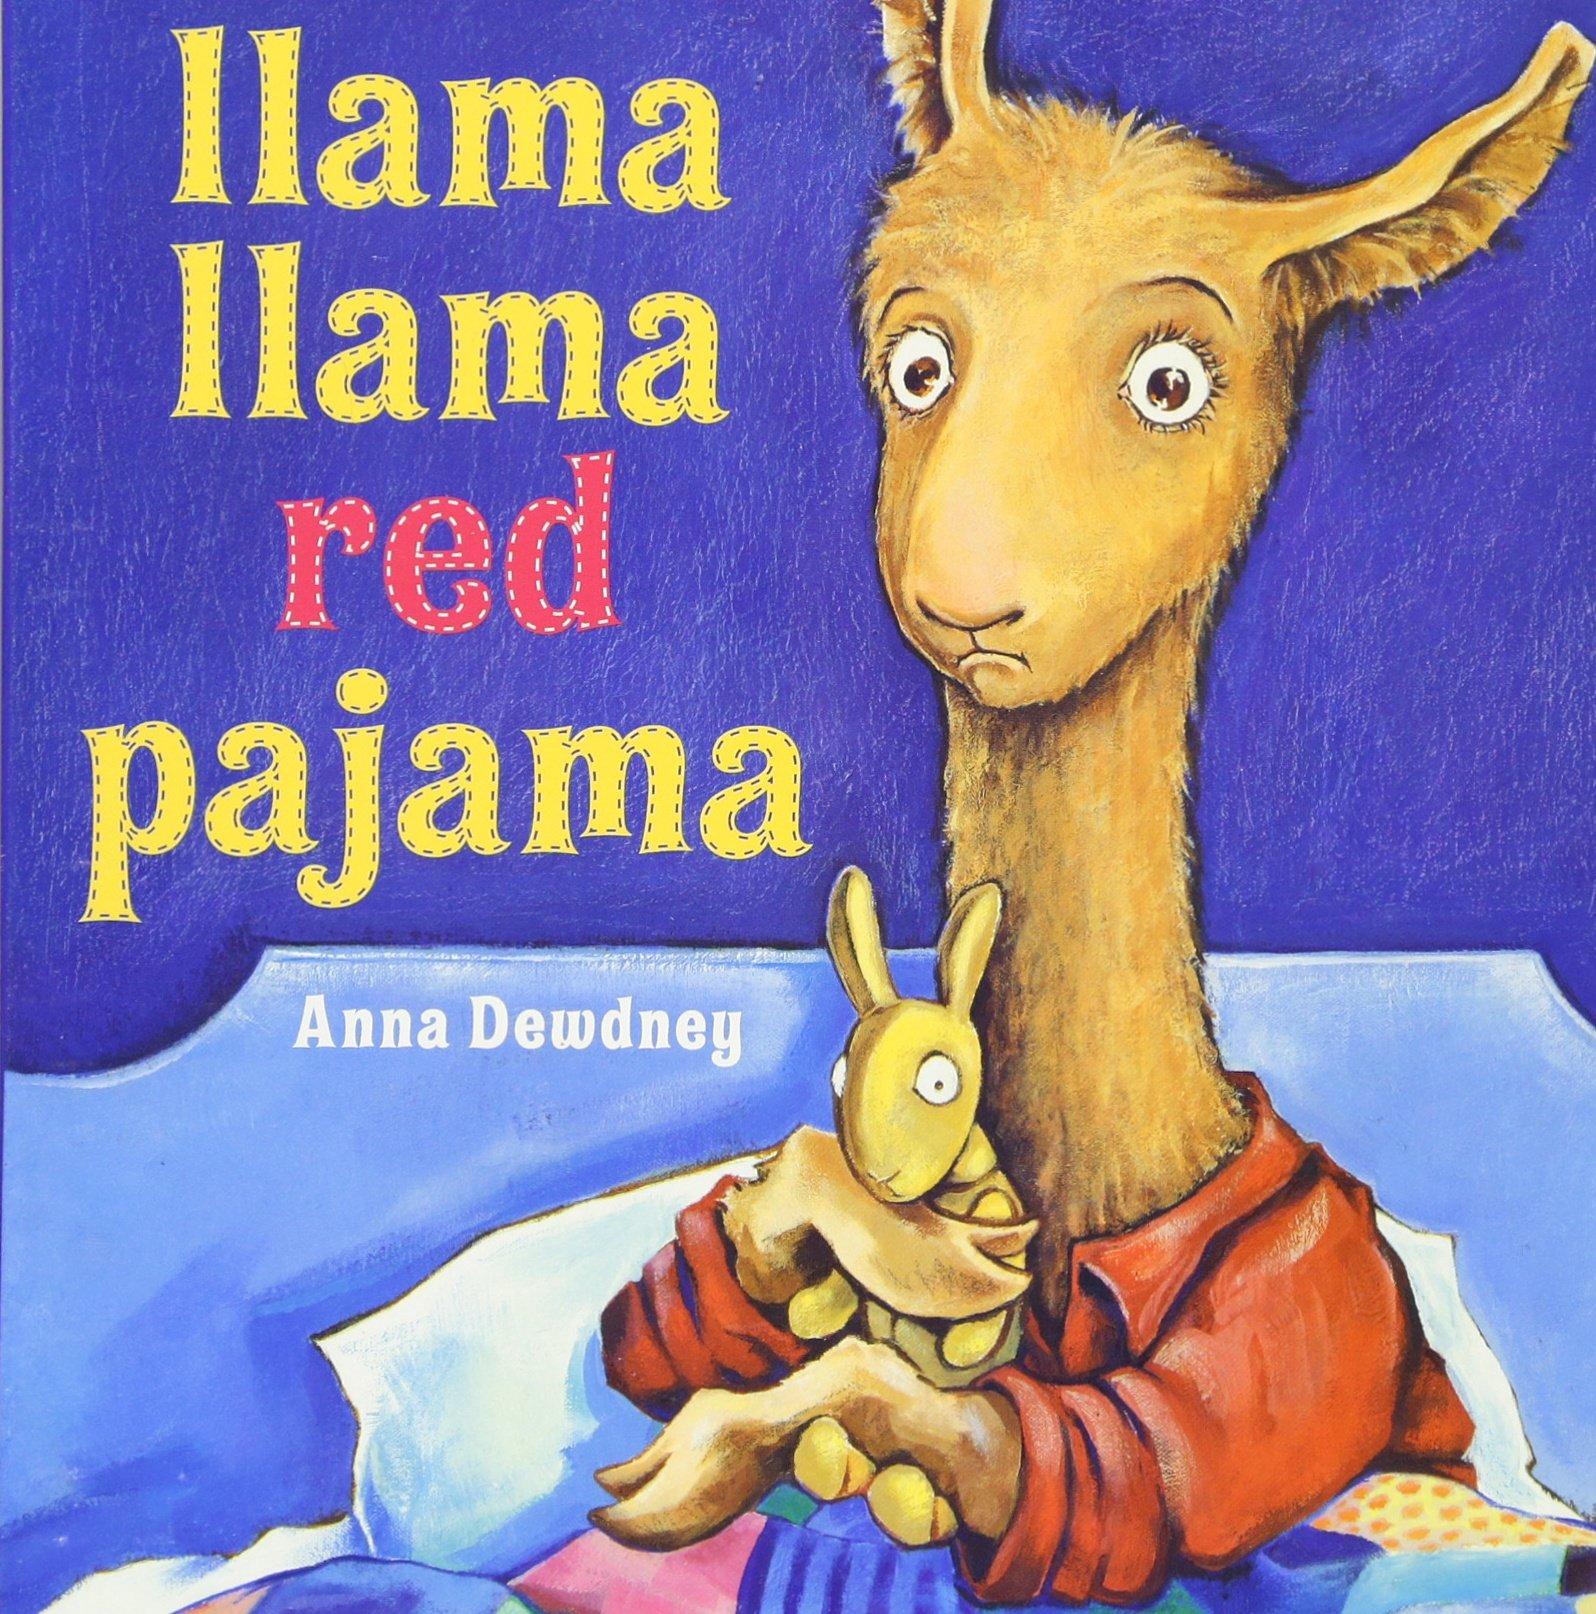 llama llama red pajama anna dewdney 9780451474575 amazon com books